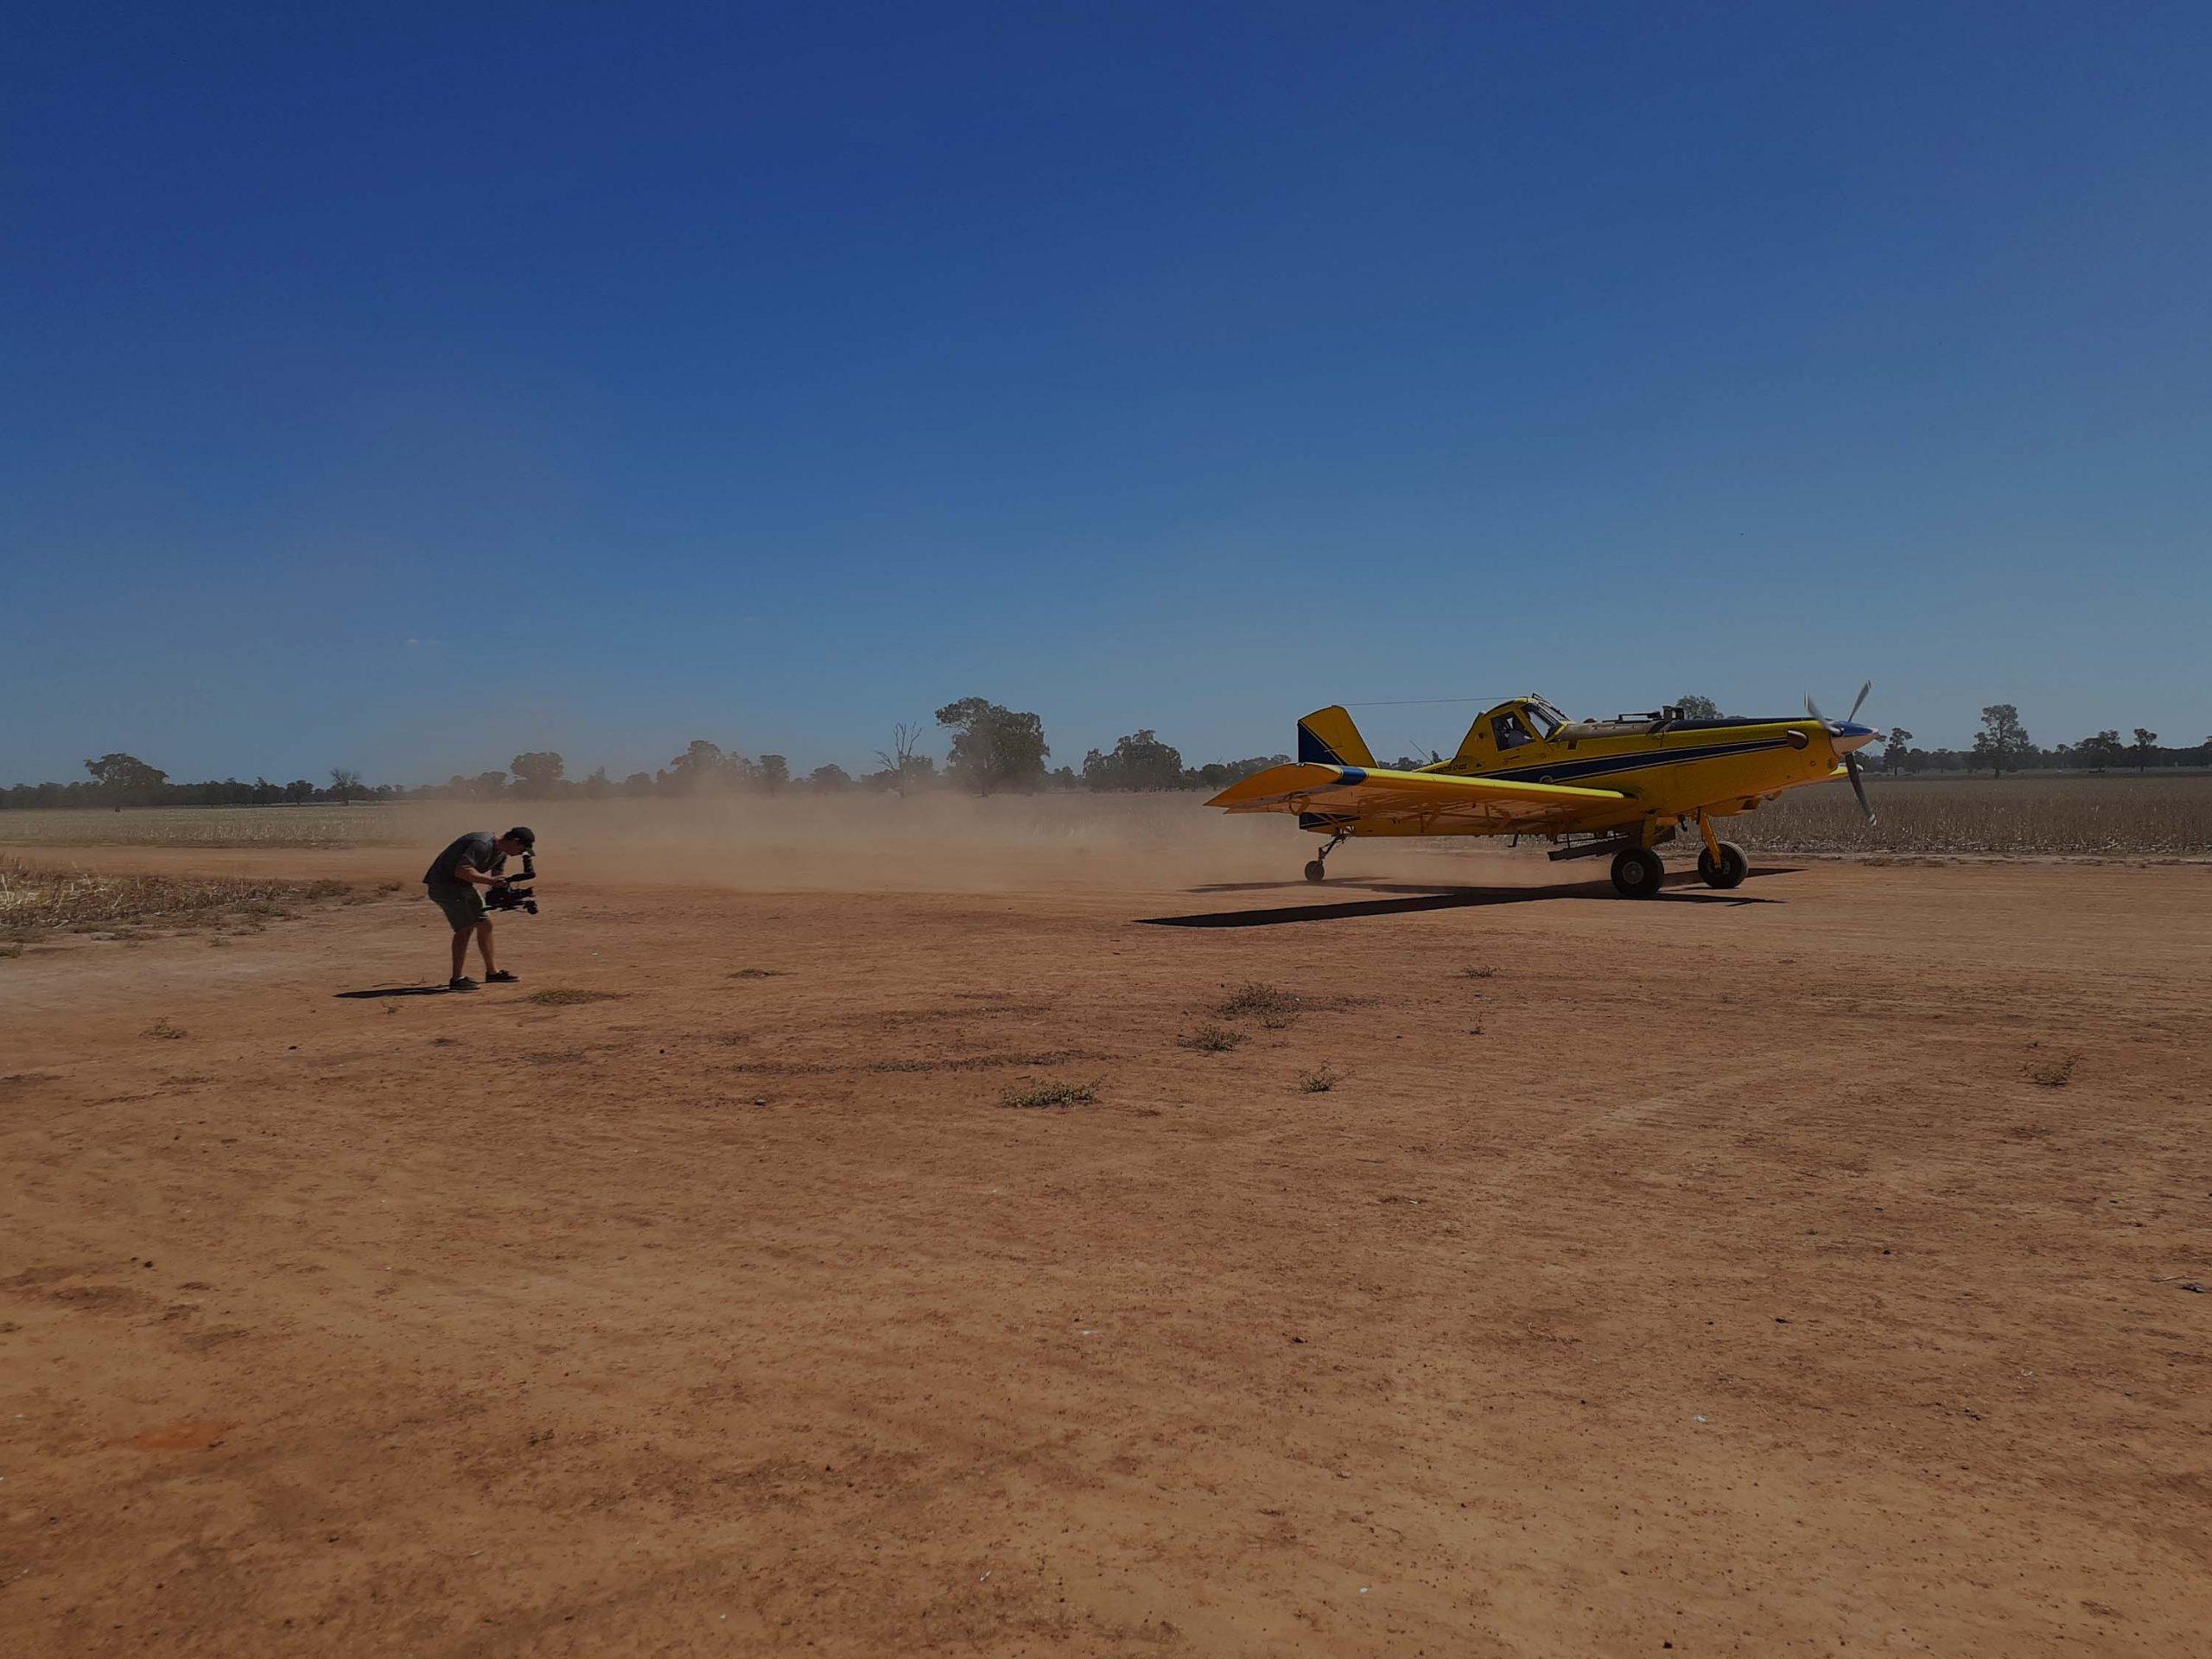 Videographer shooting small plane taking off